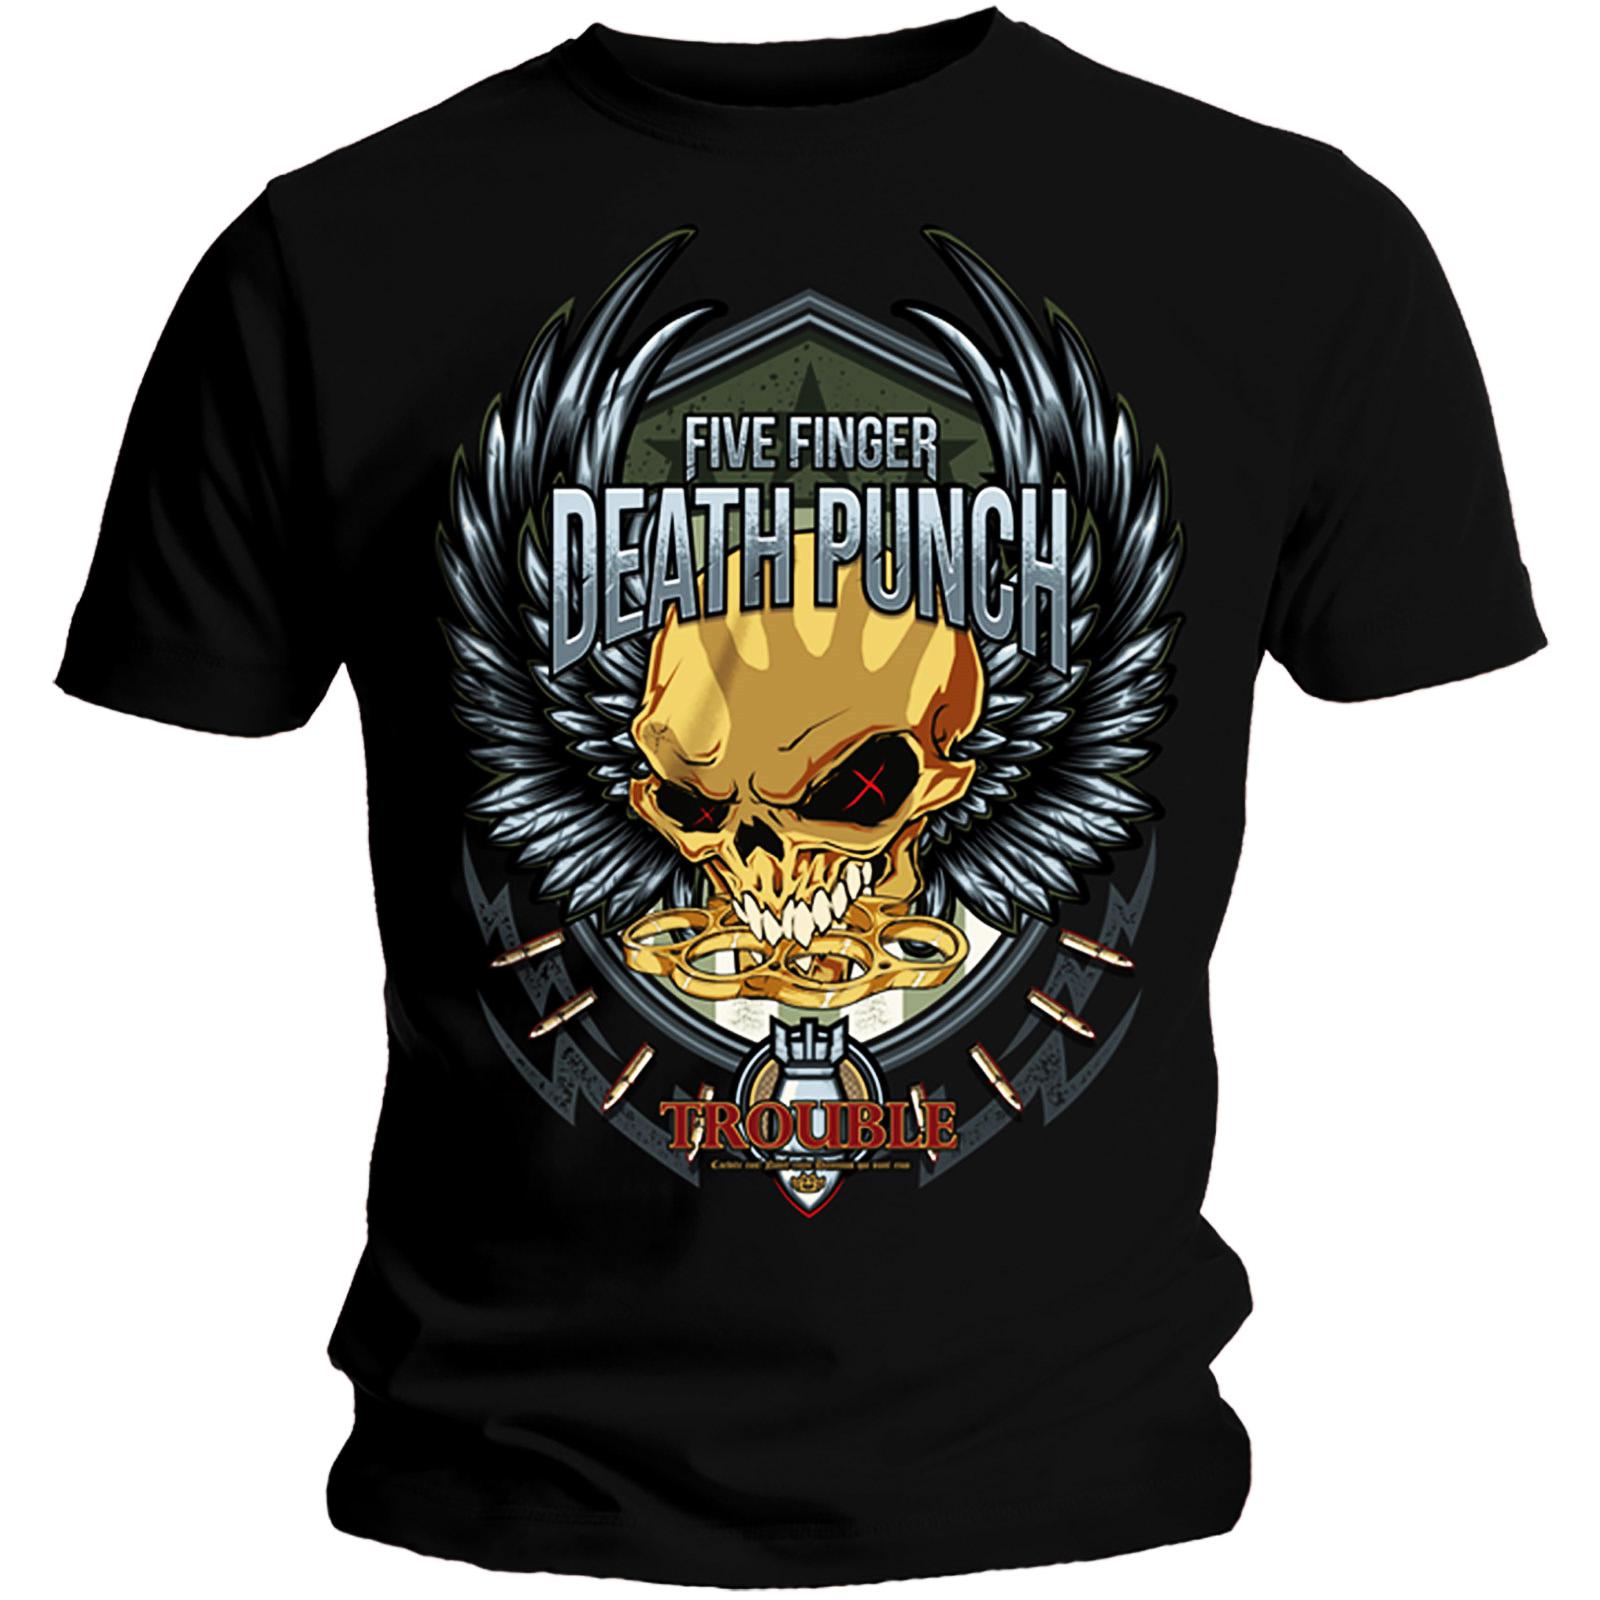 Official-T-Shirt-Five-Finger-Death-Punch-TROUBLE-Decade-of-Destruction-All-Sizes thumbnail 5